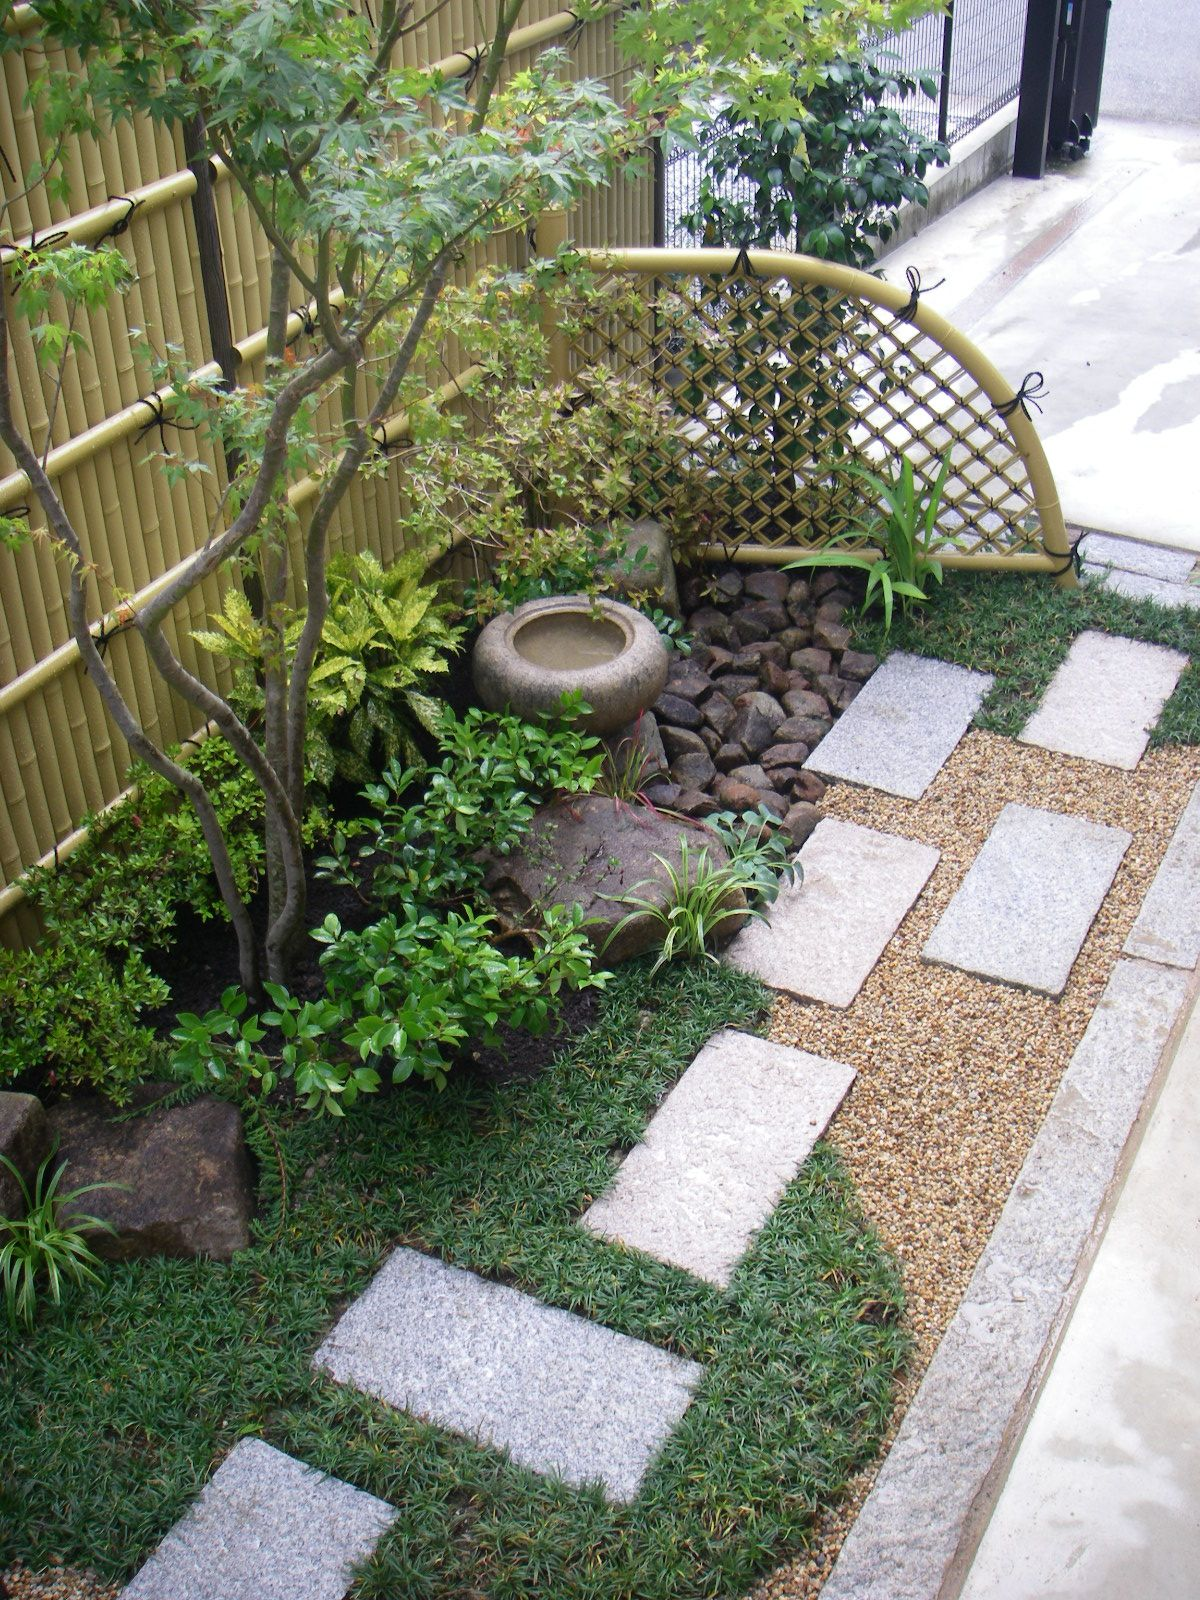 Landscaping Around Above Ground Pool Landscapingstone Small Japanese Garden Zen Garden Design Japanese Garden Landscape